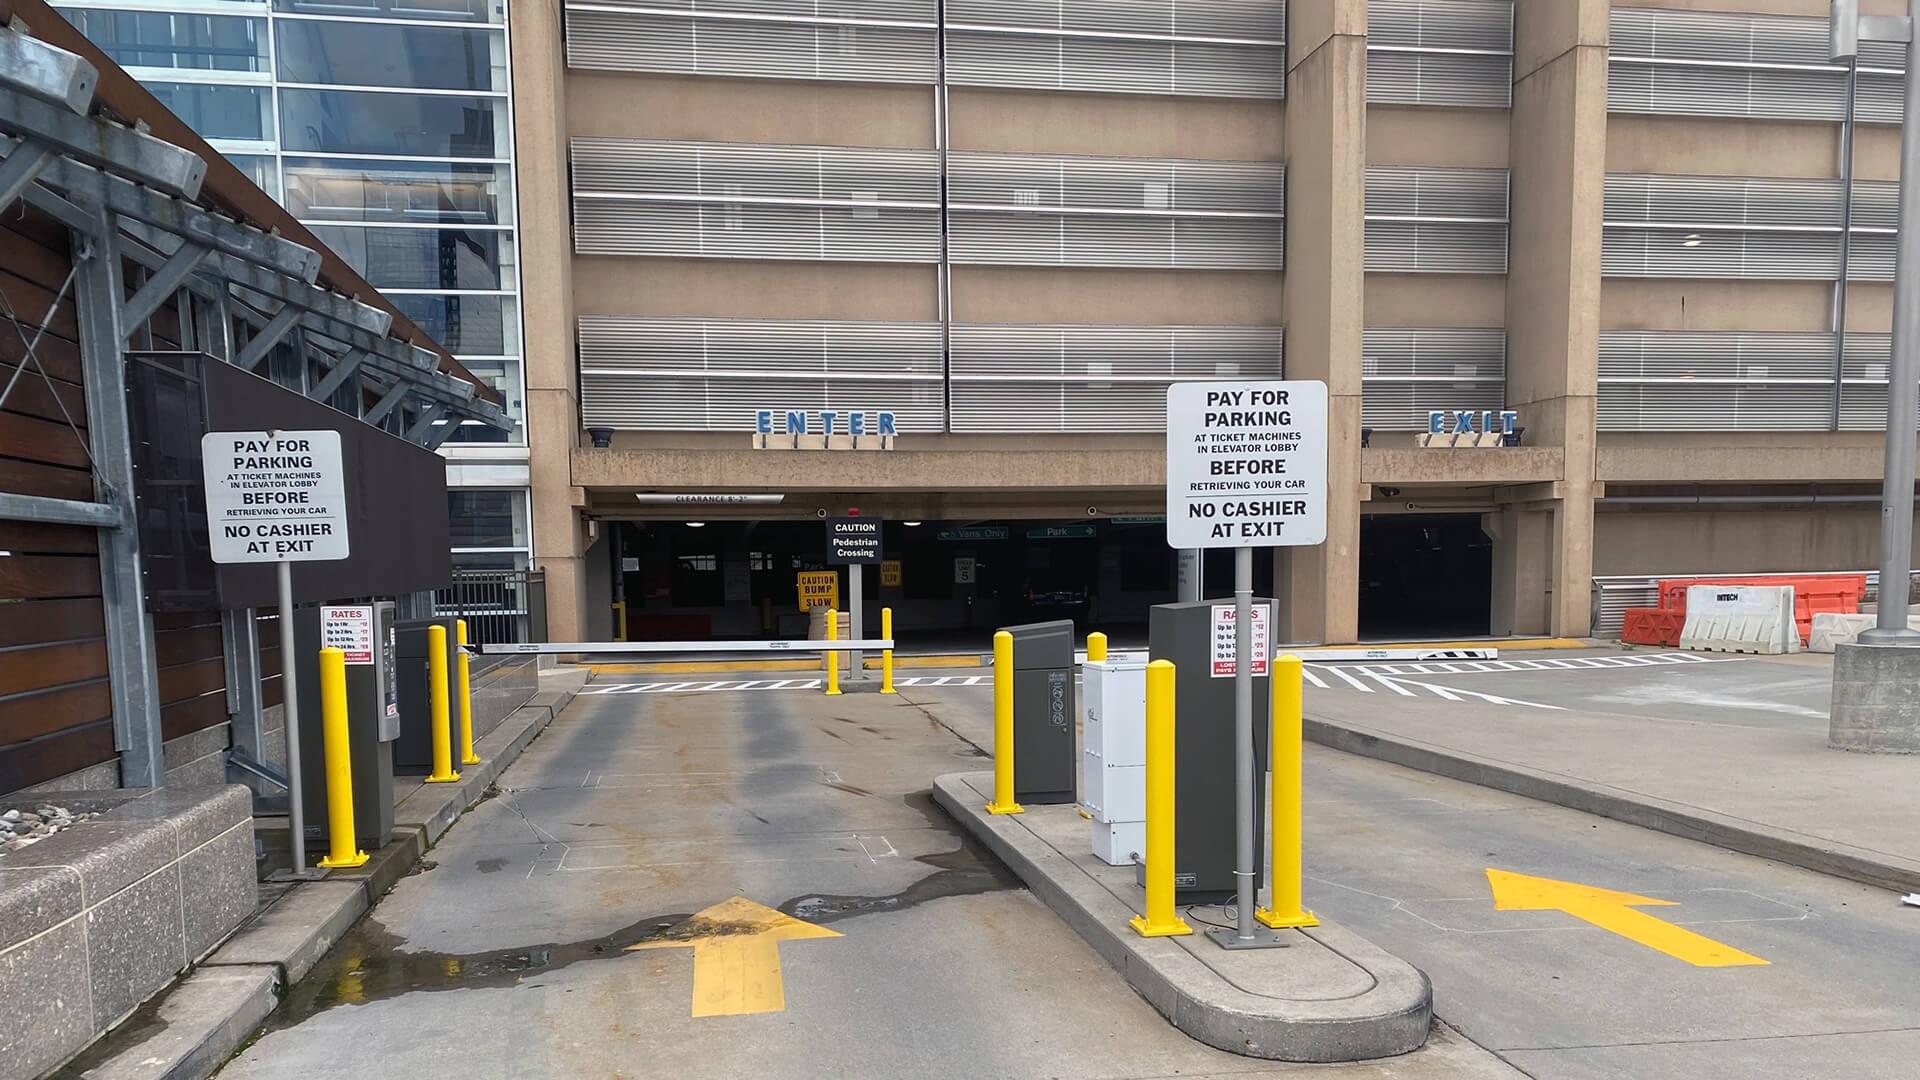 amtrak monthly parking